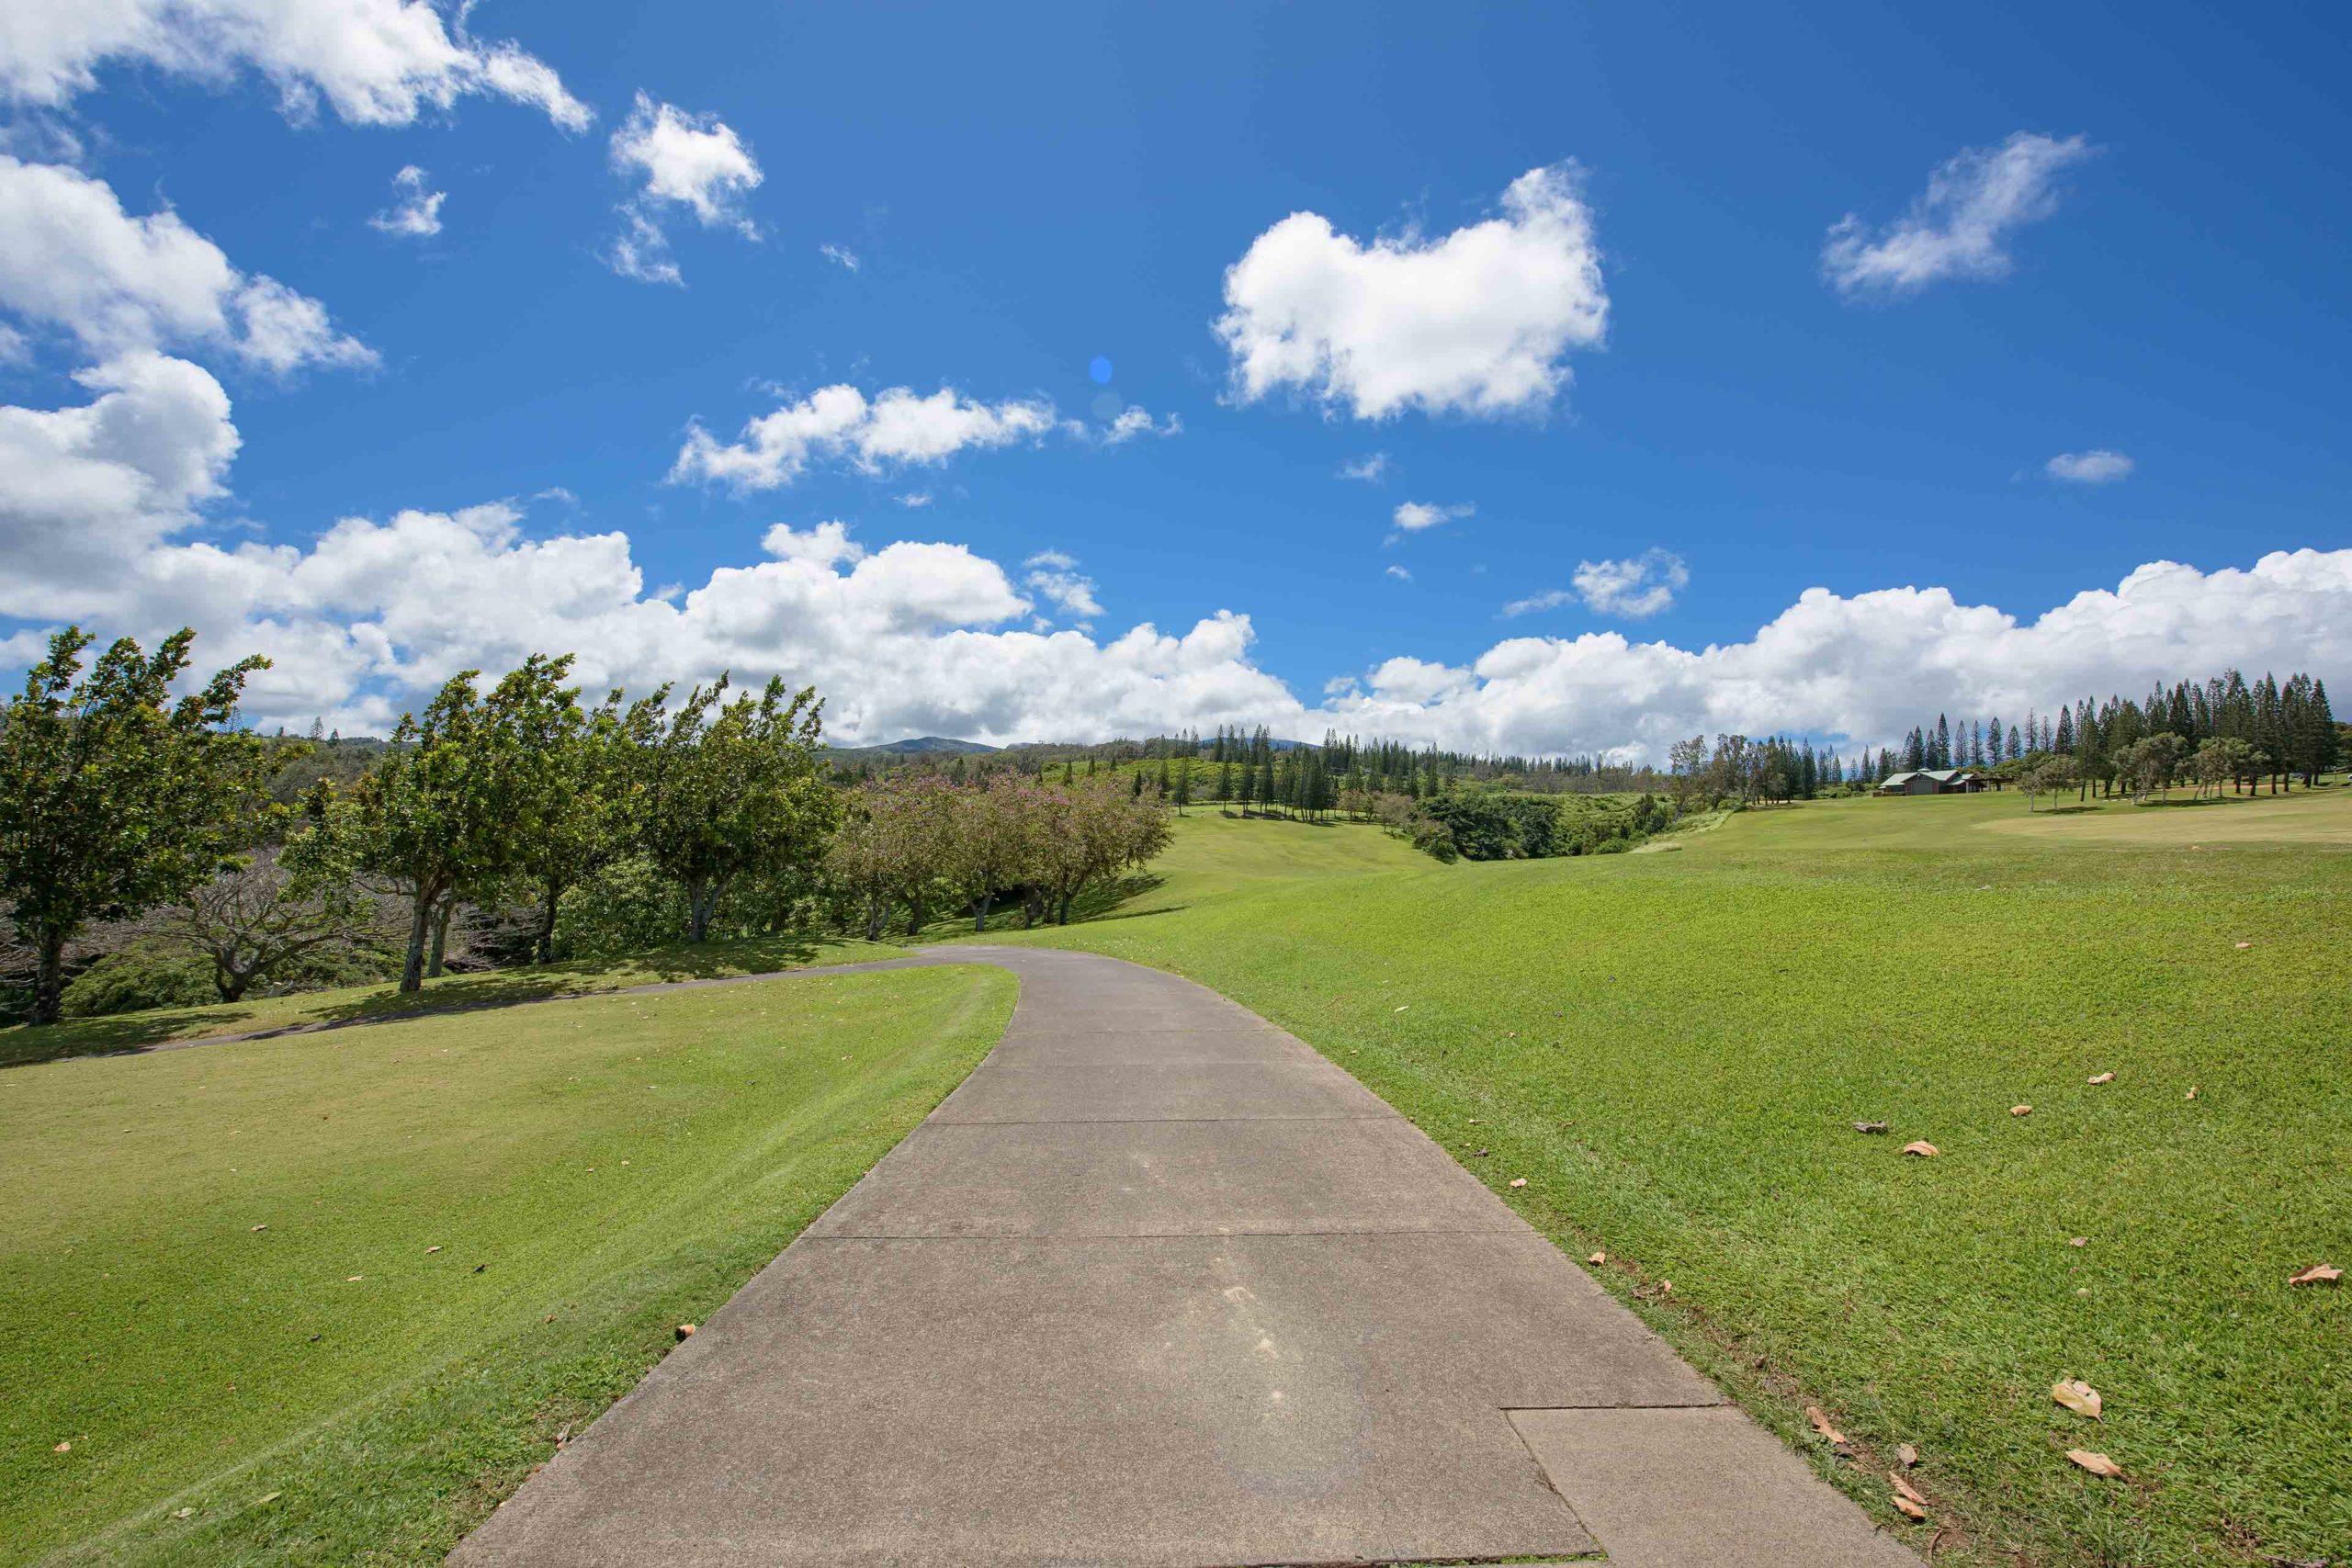 View of Kapalua Village Trails in Kapalua Maui Hawaii